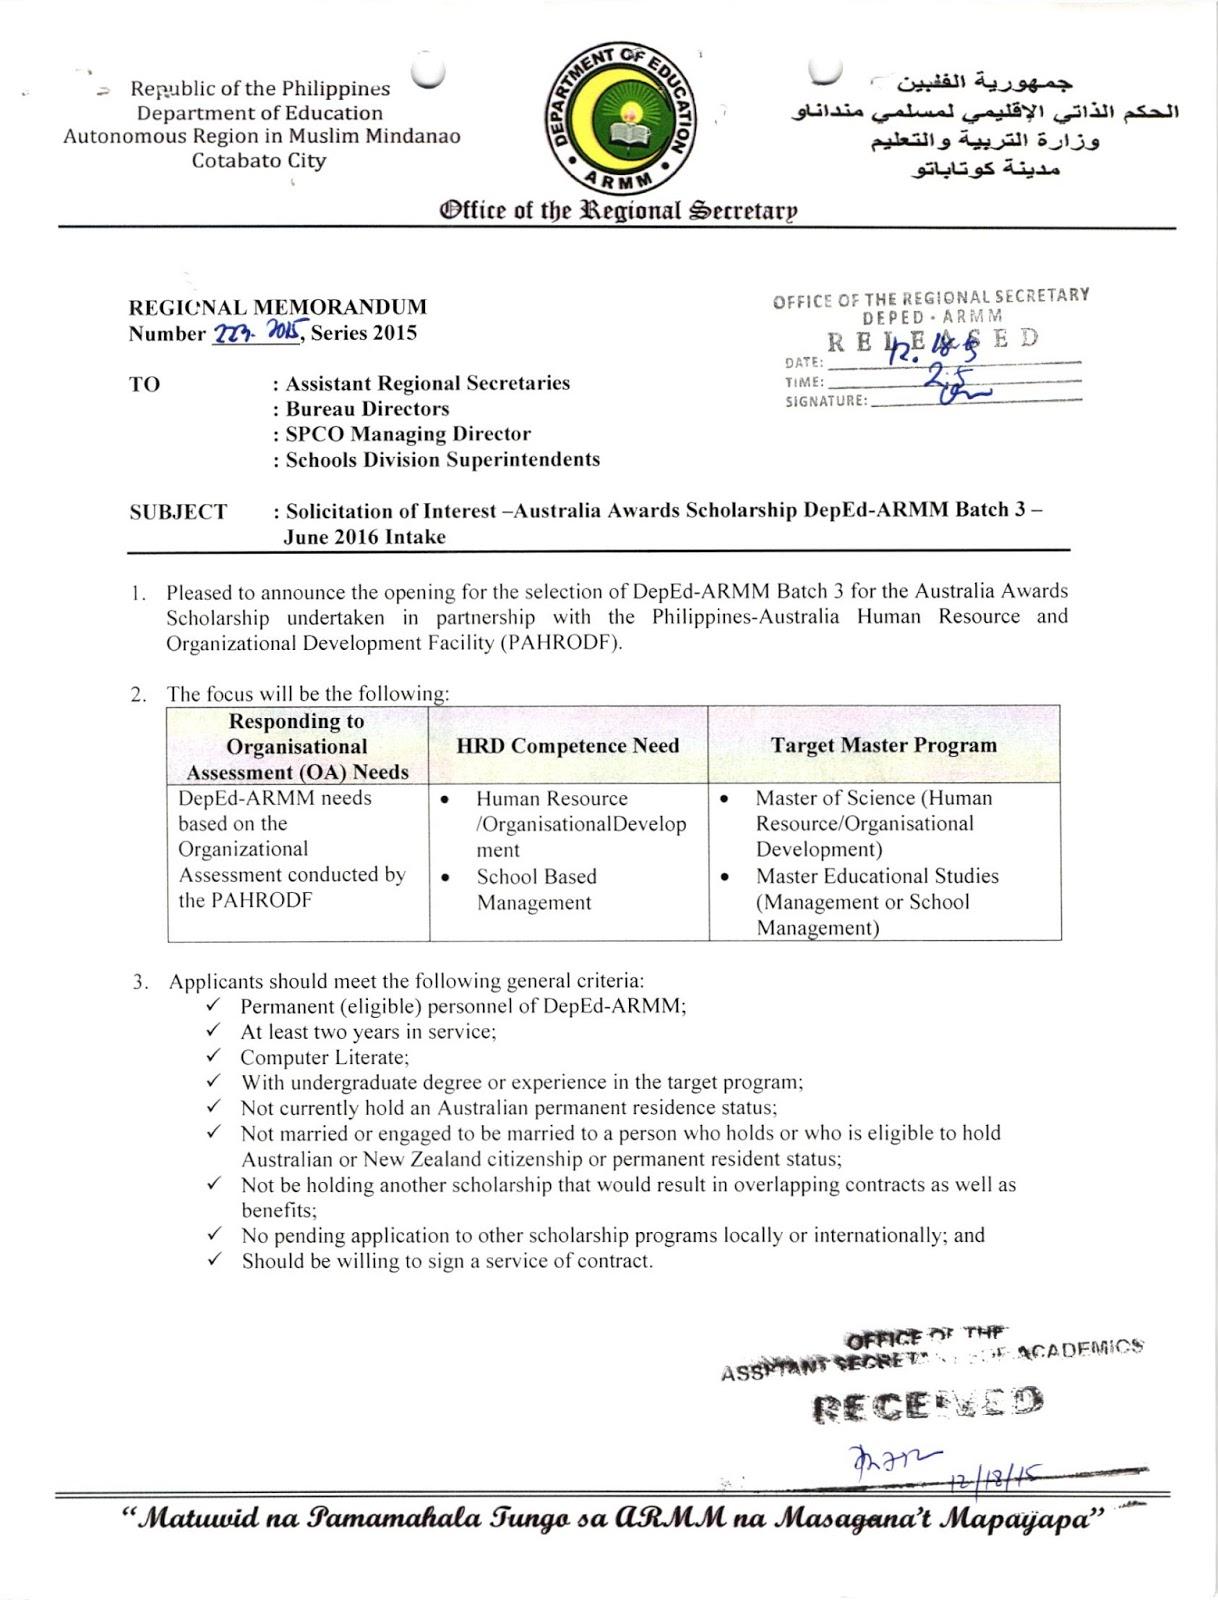 mujiv hataman scholarship grant essays